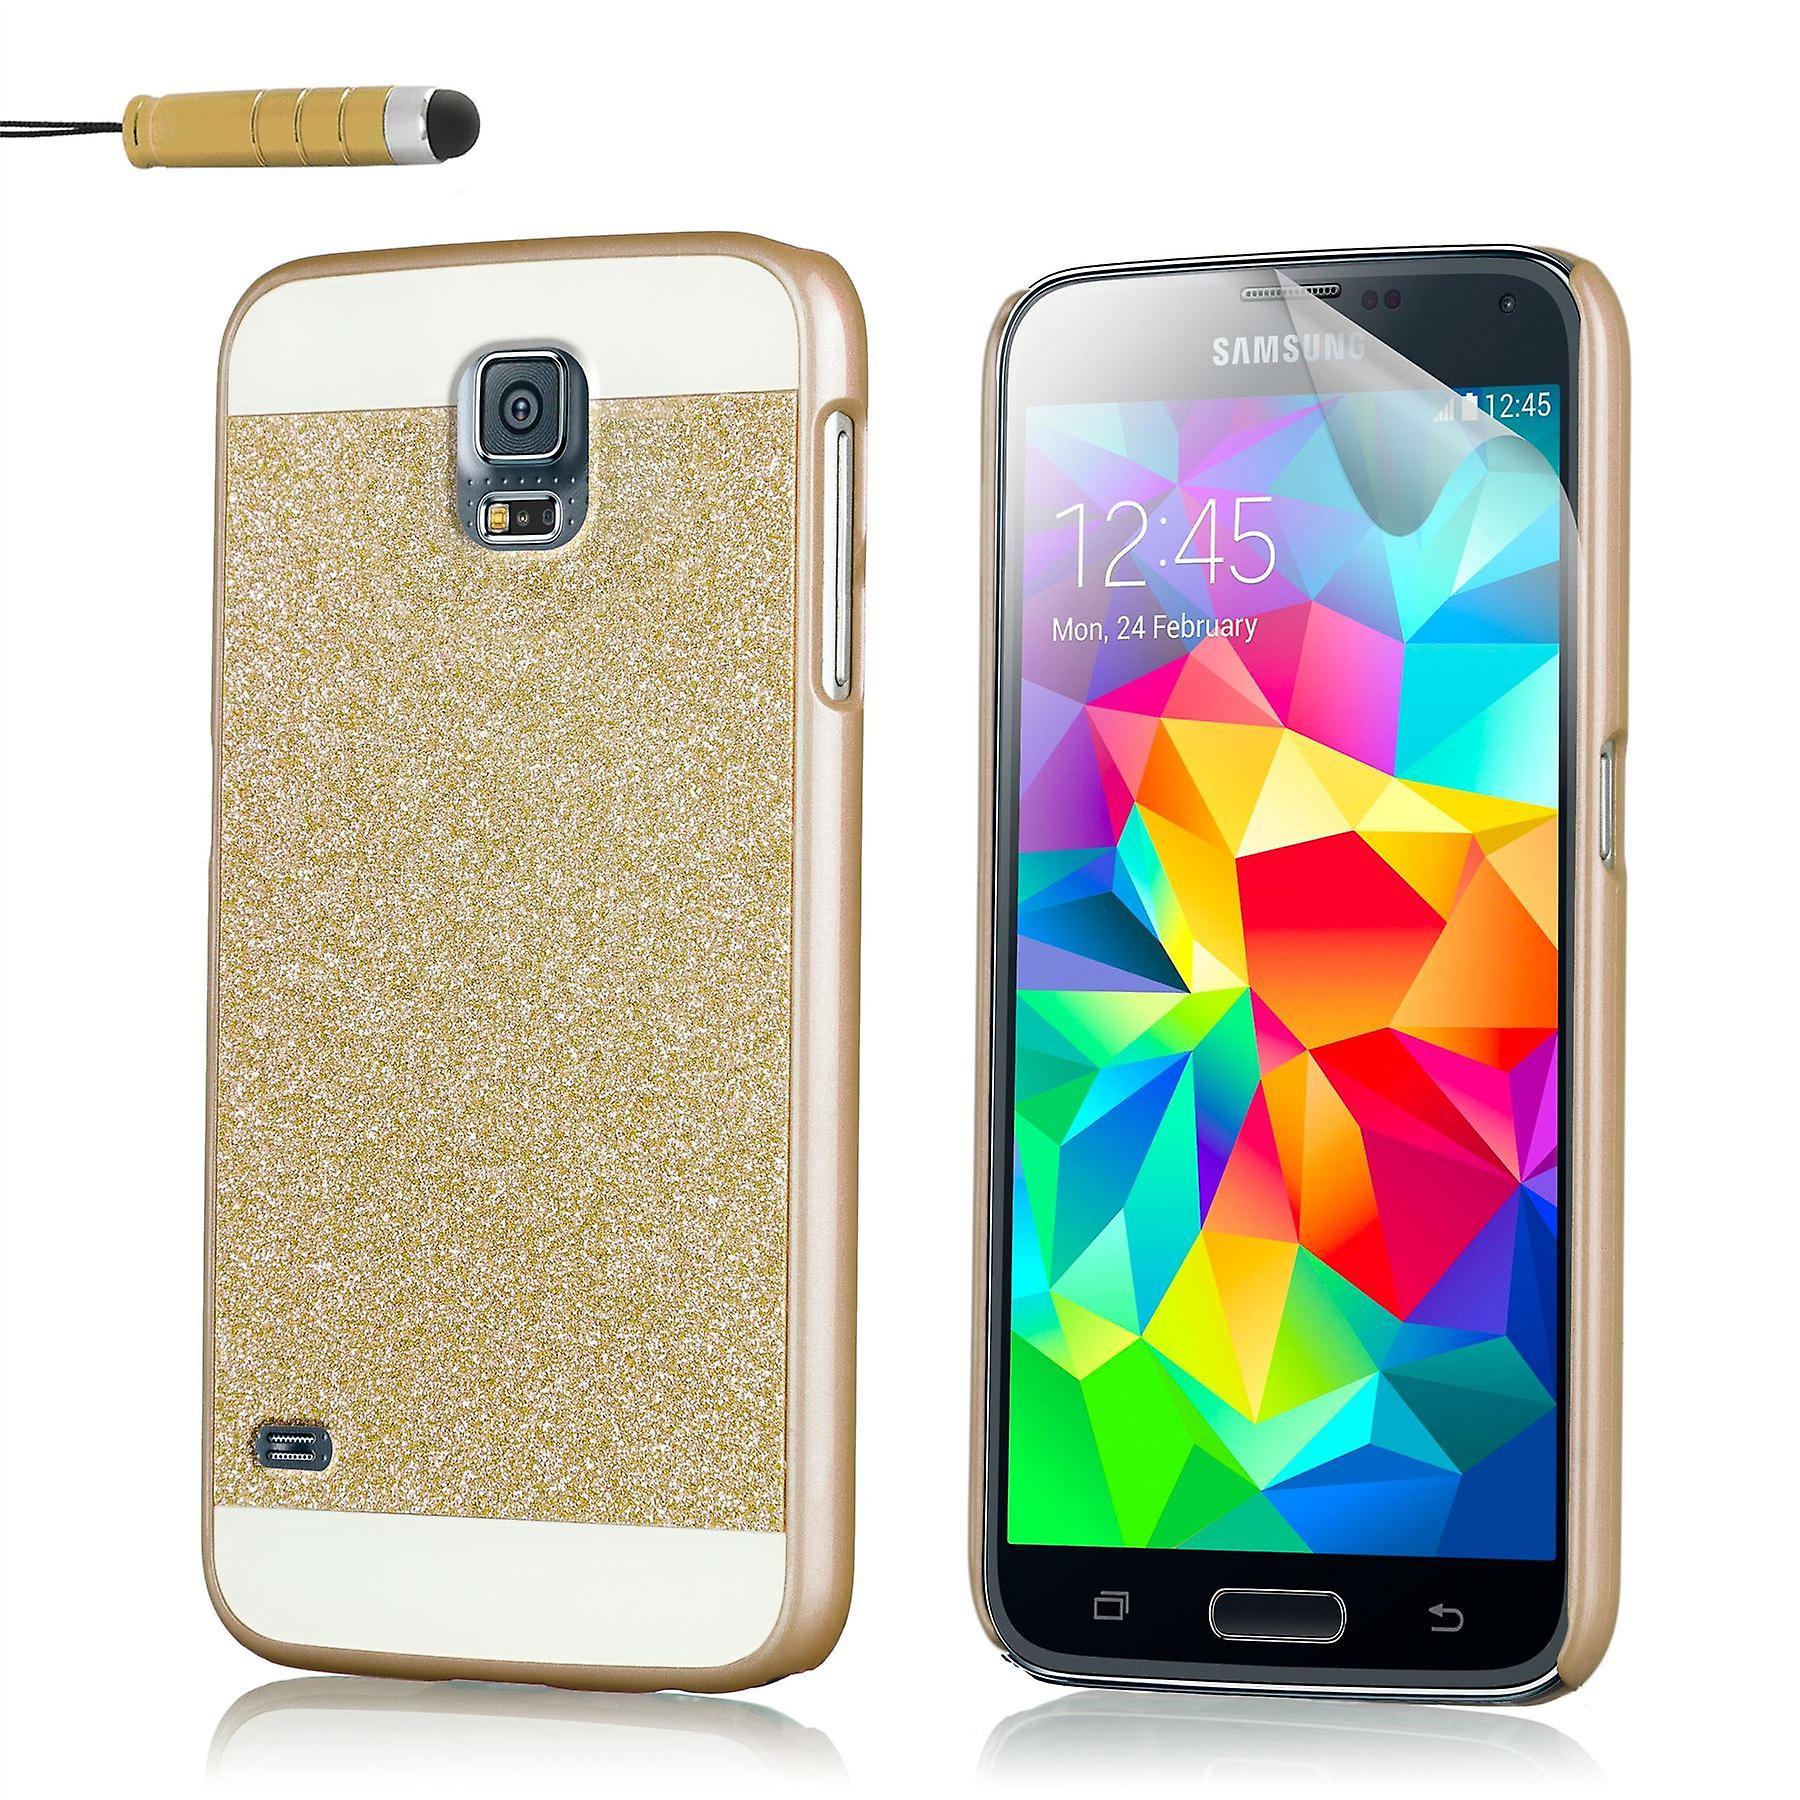 Glitter case for Samsung Galaxy S5 SM-G900 + stylus - Gold